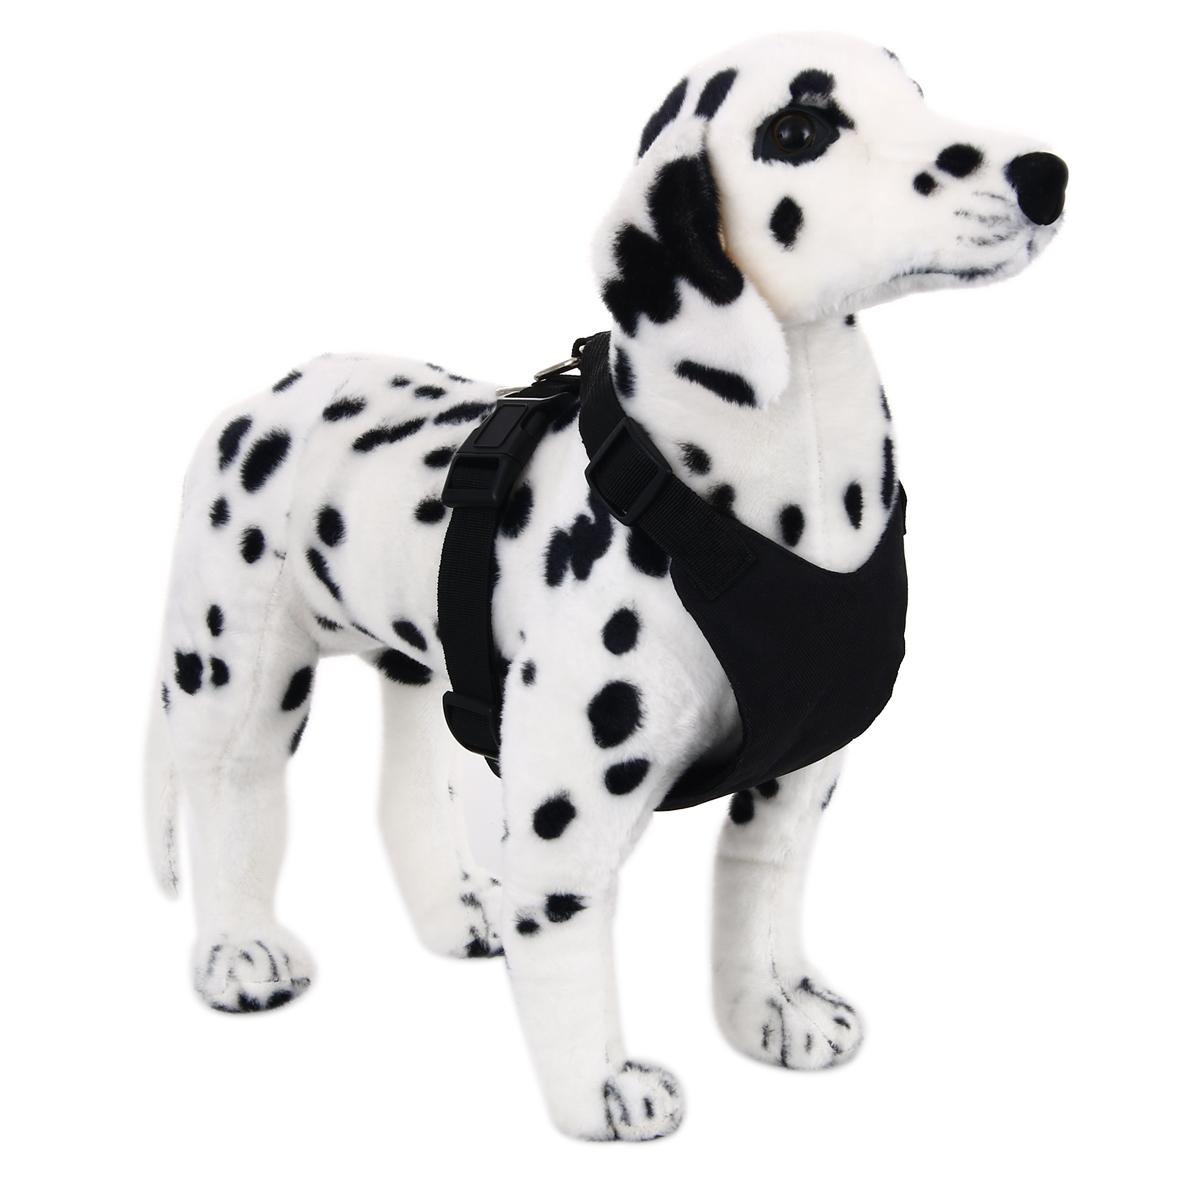 Detail produk dari Adjustable Dog Harness for Medium and Large Breed plus Seatbelt Safe Easy Walk Black S PS025